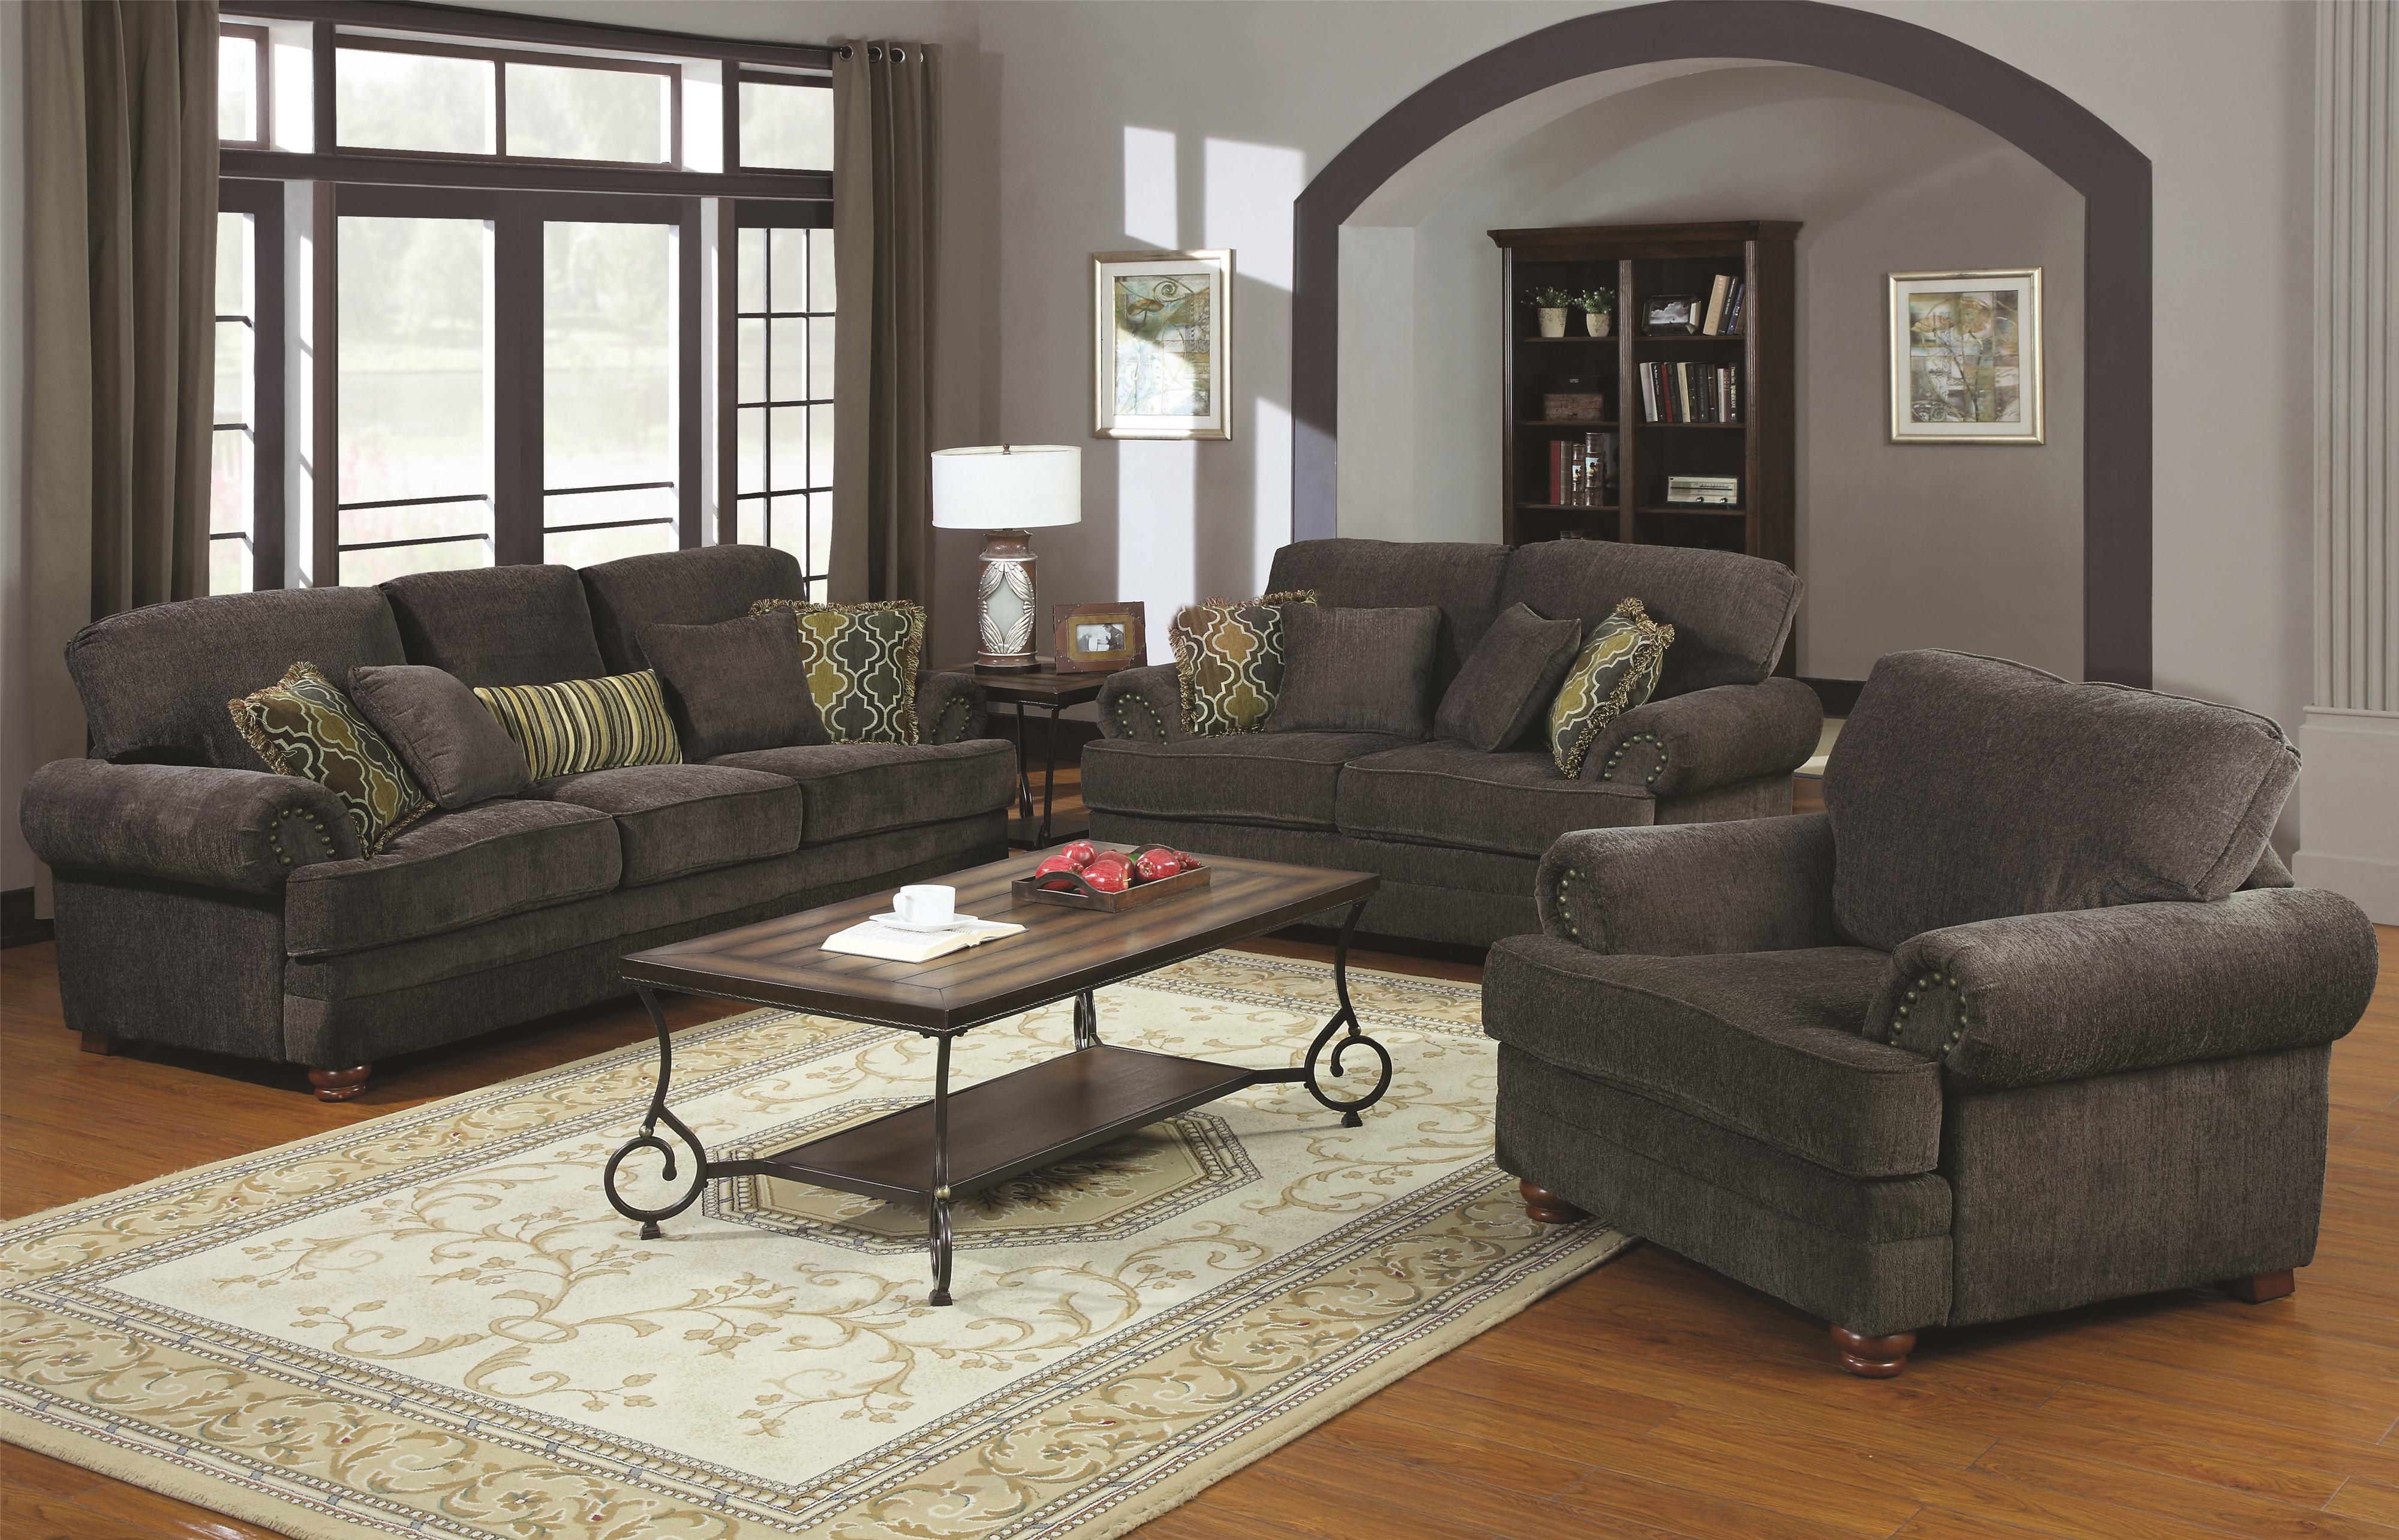 Colton Traditional Sofa With Elegant Design